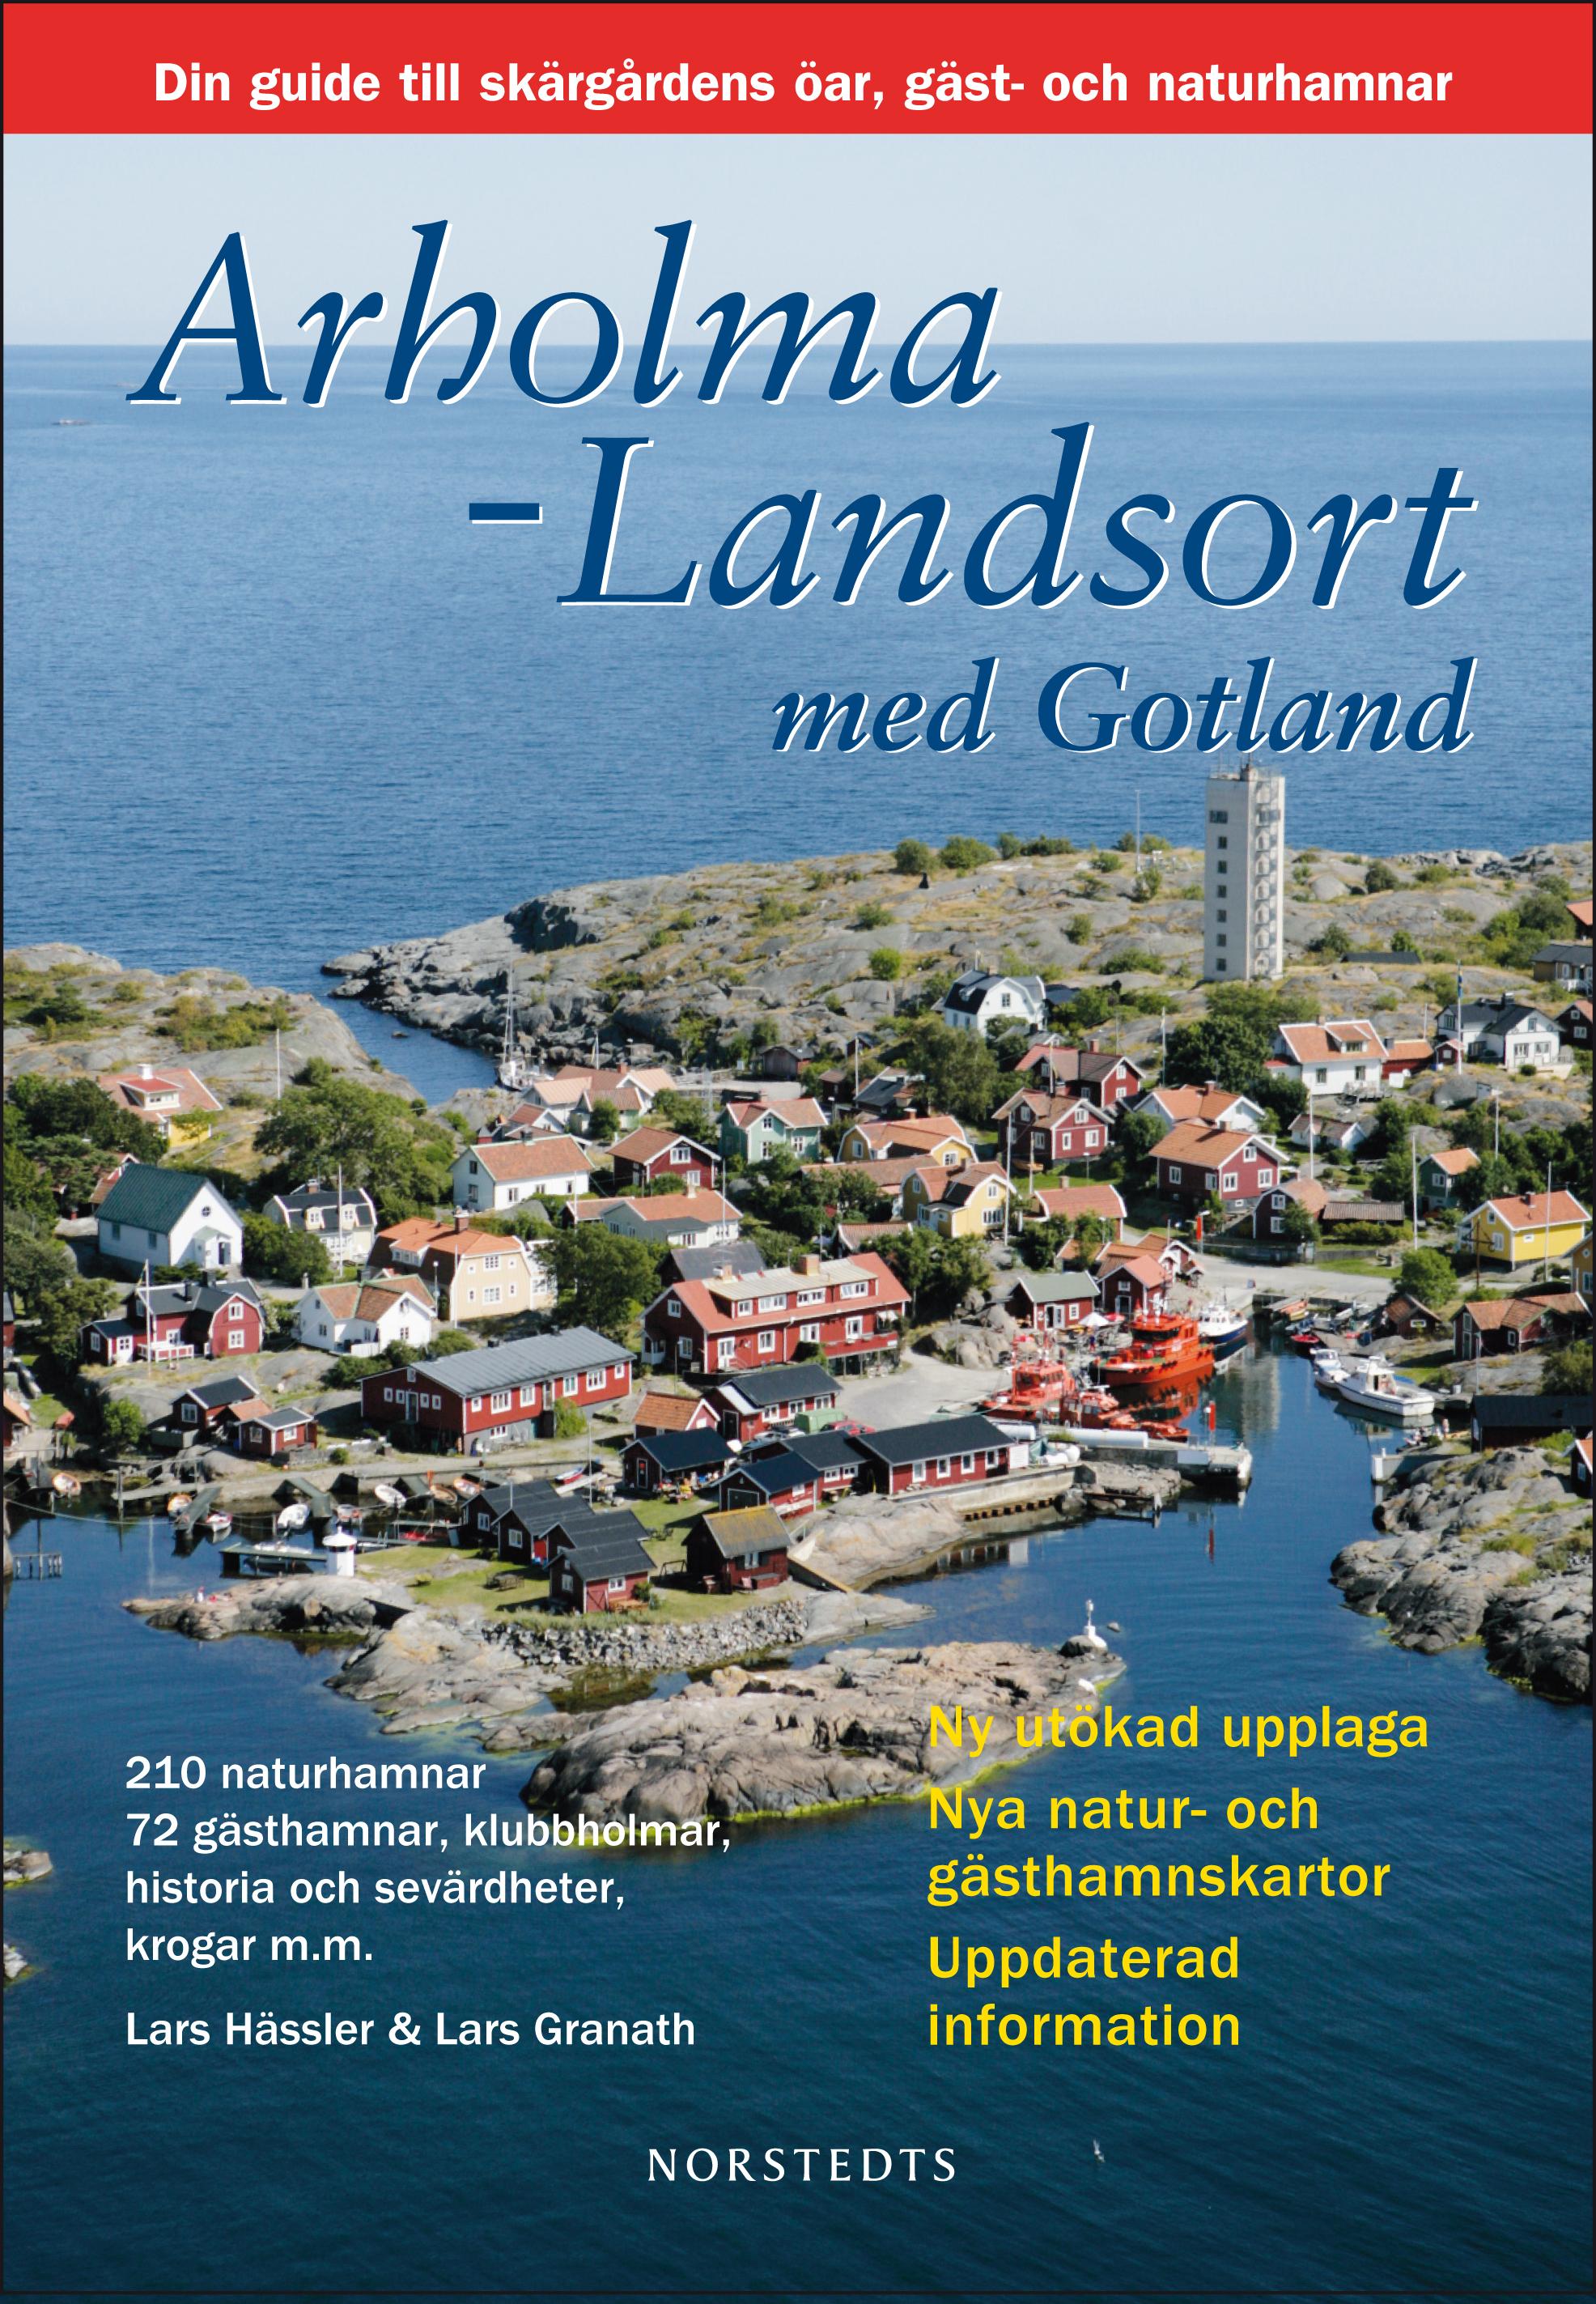 Arholma-Landsort 2010